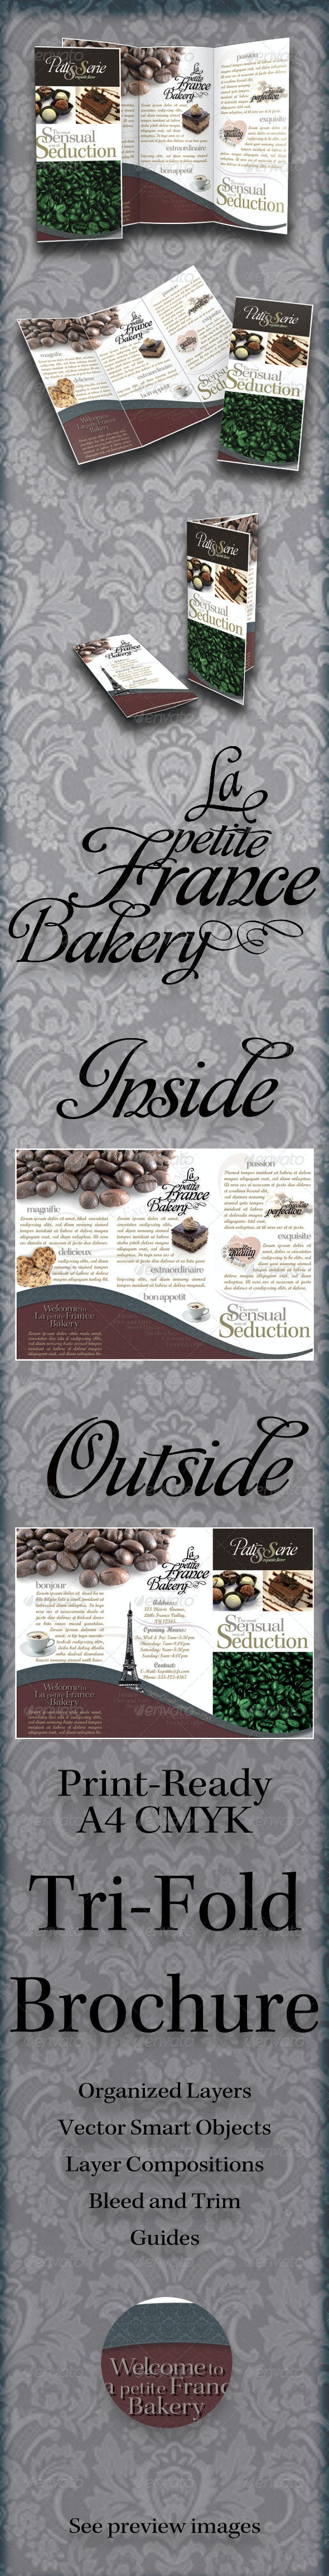 Tri-Fold Brochure - La Petite France Bakery - Corporate Brochures